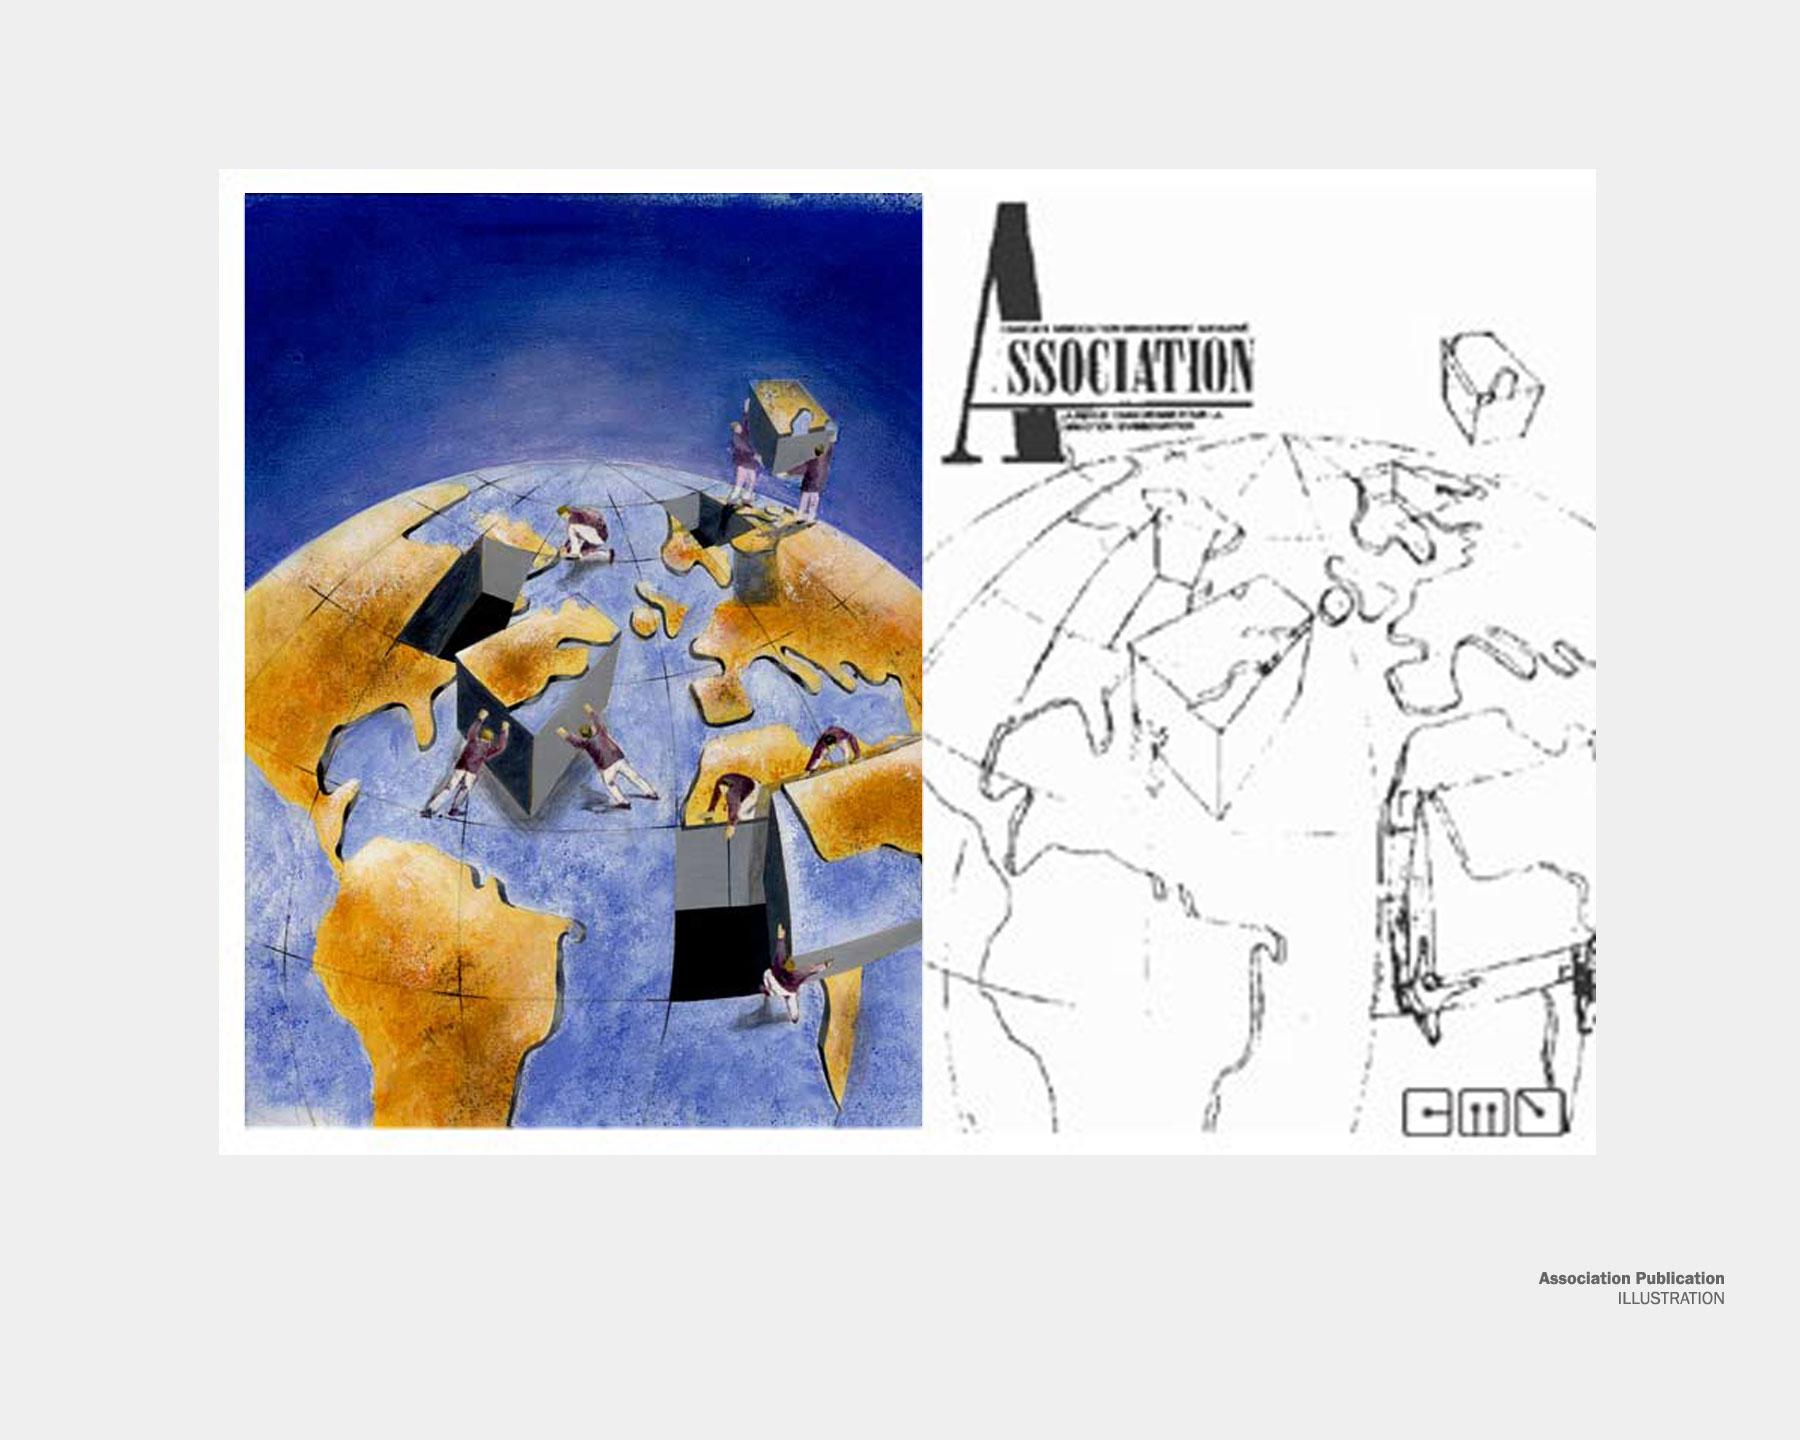 P-CMY-Illustration-Assocaition-1800